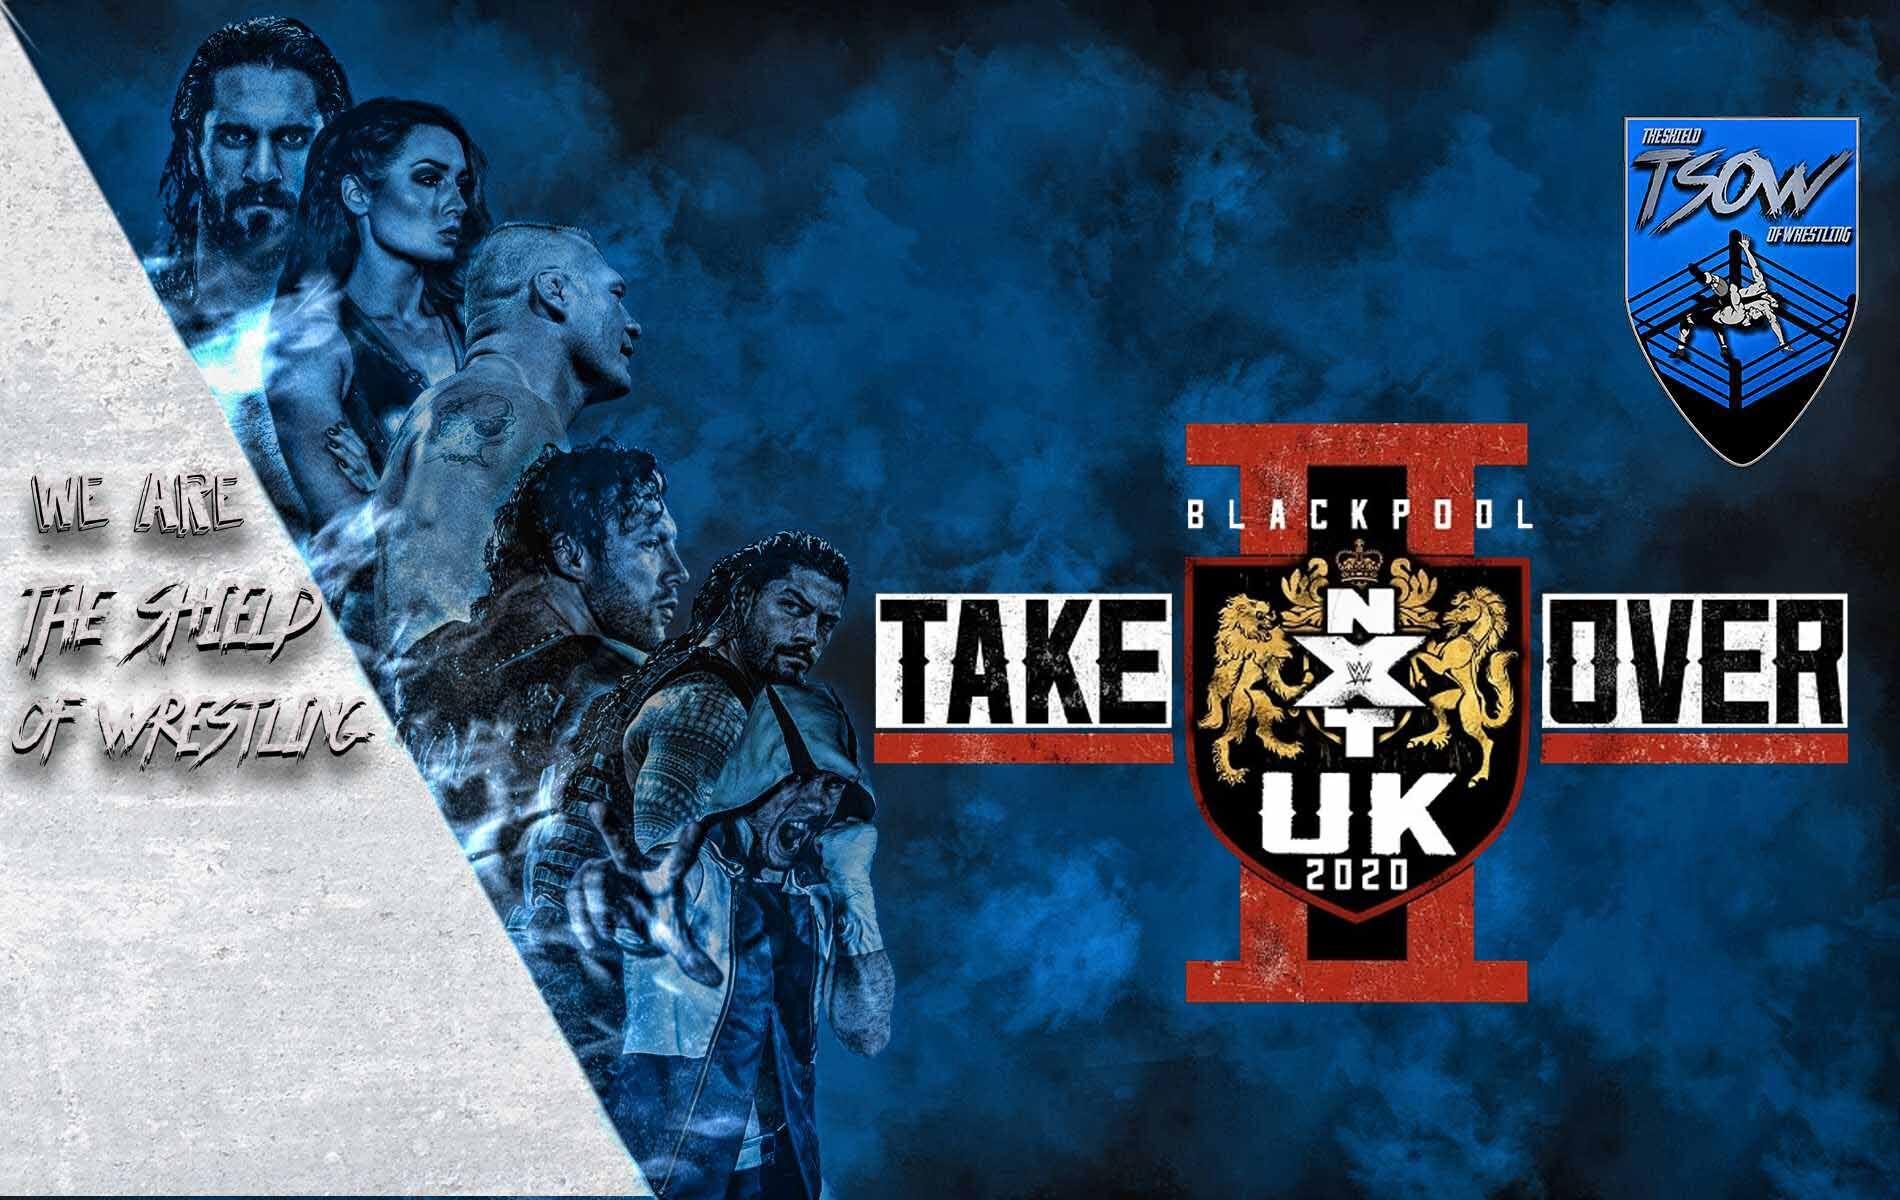 Annunciati due match titolati - NXT UK TakeOver: Blackpool II